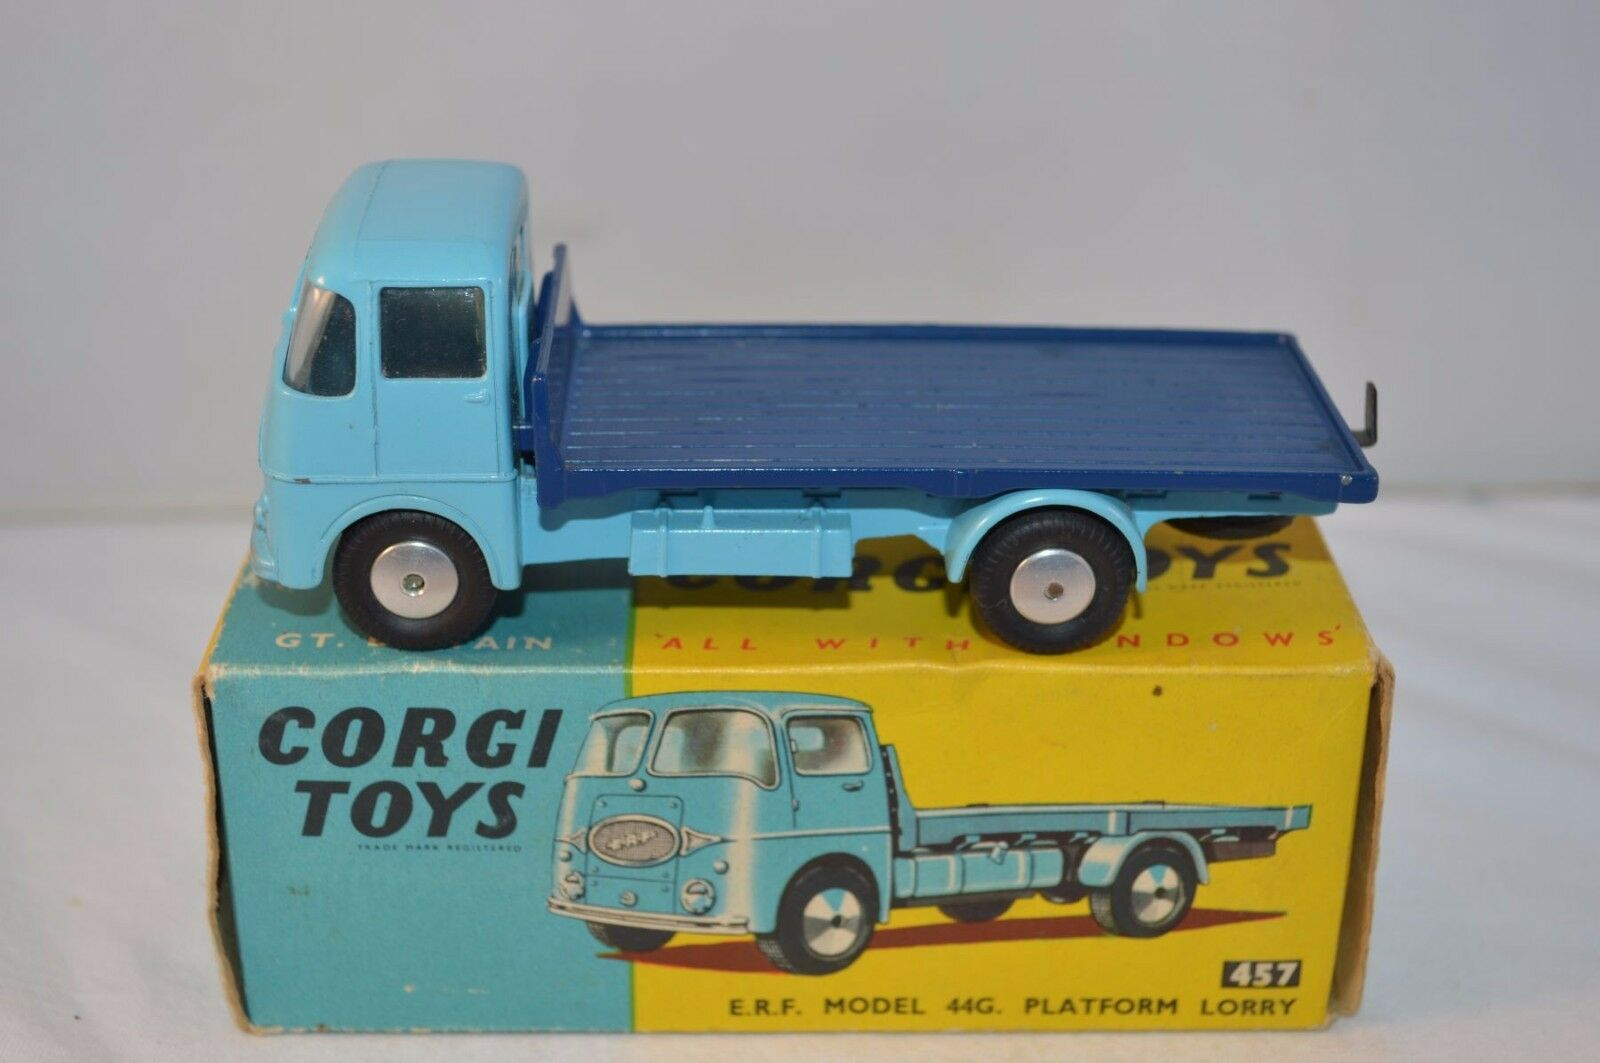 Corgi Toys 457 E.R.F. Model 44G Platform Lorry perfect perfect perfect mint in box 8ab808